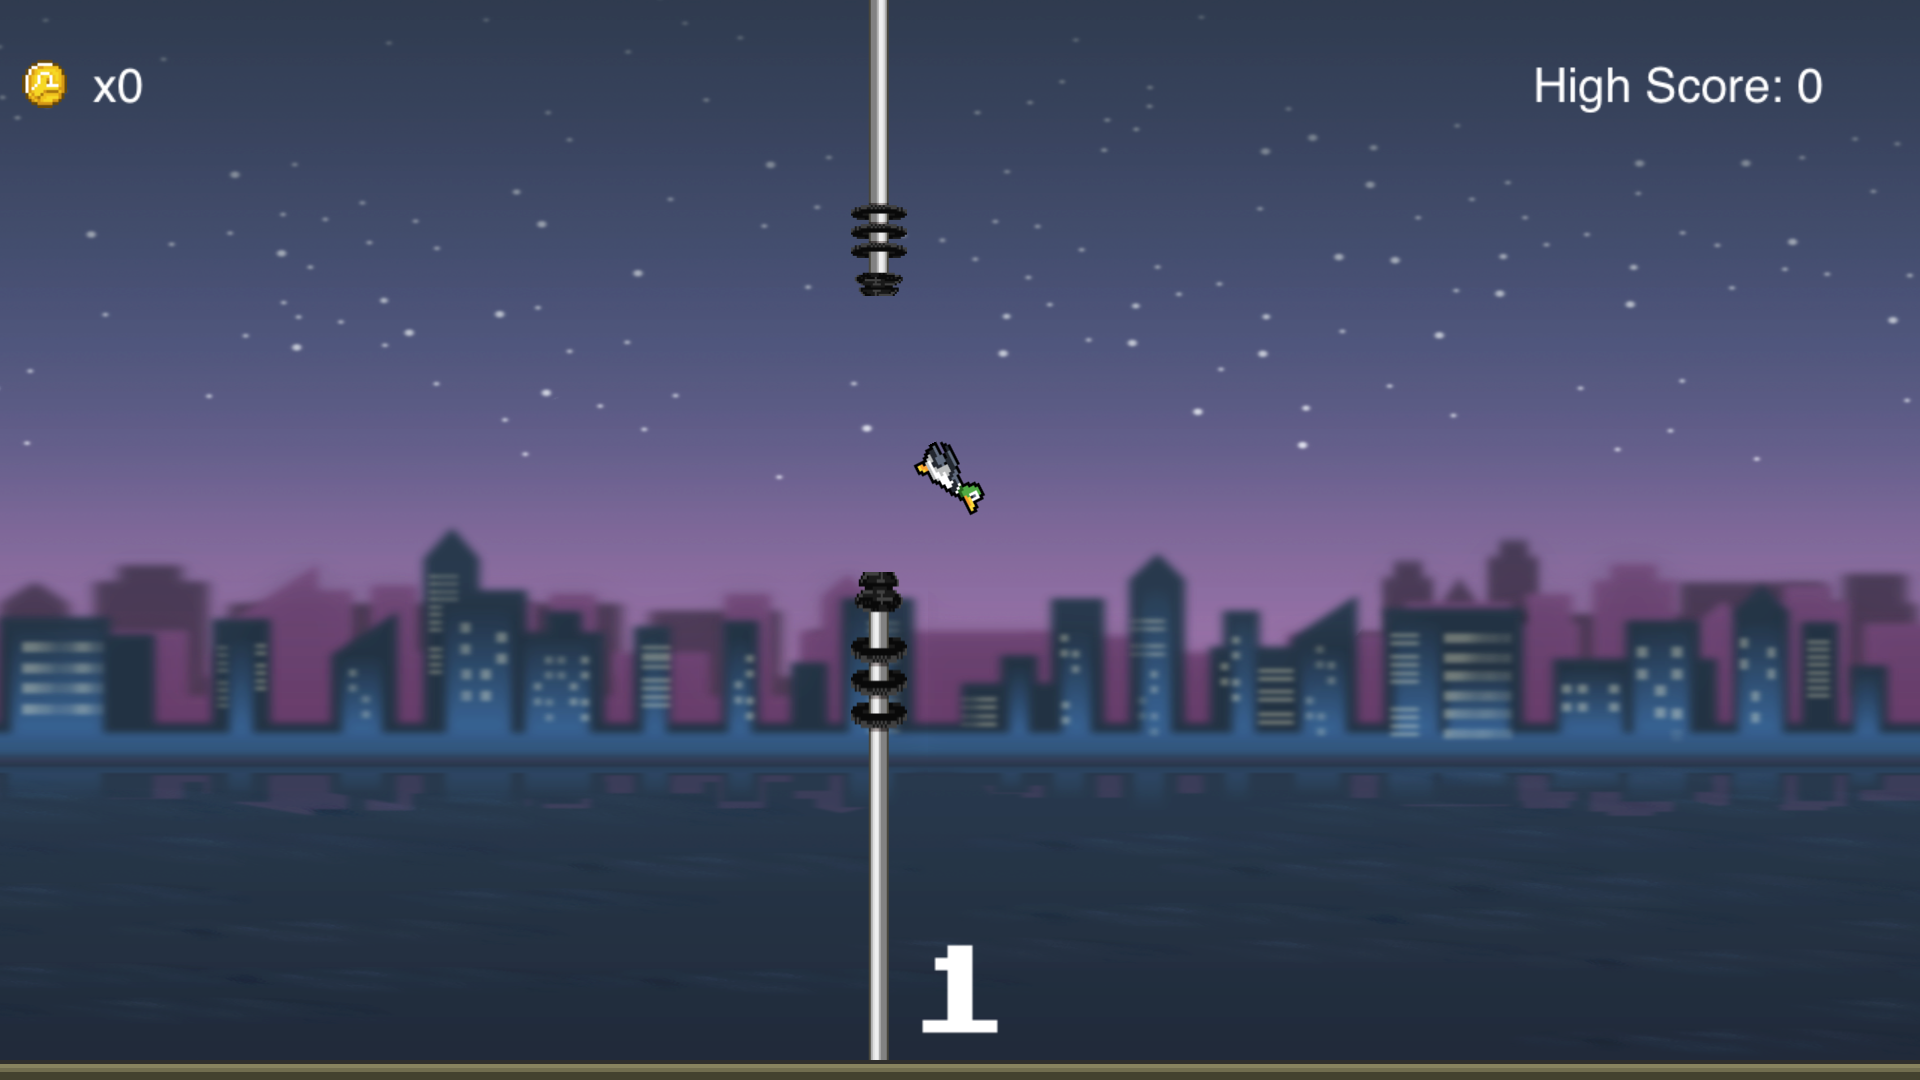 Screenshot 12 of 13